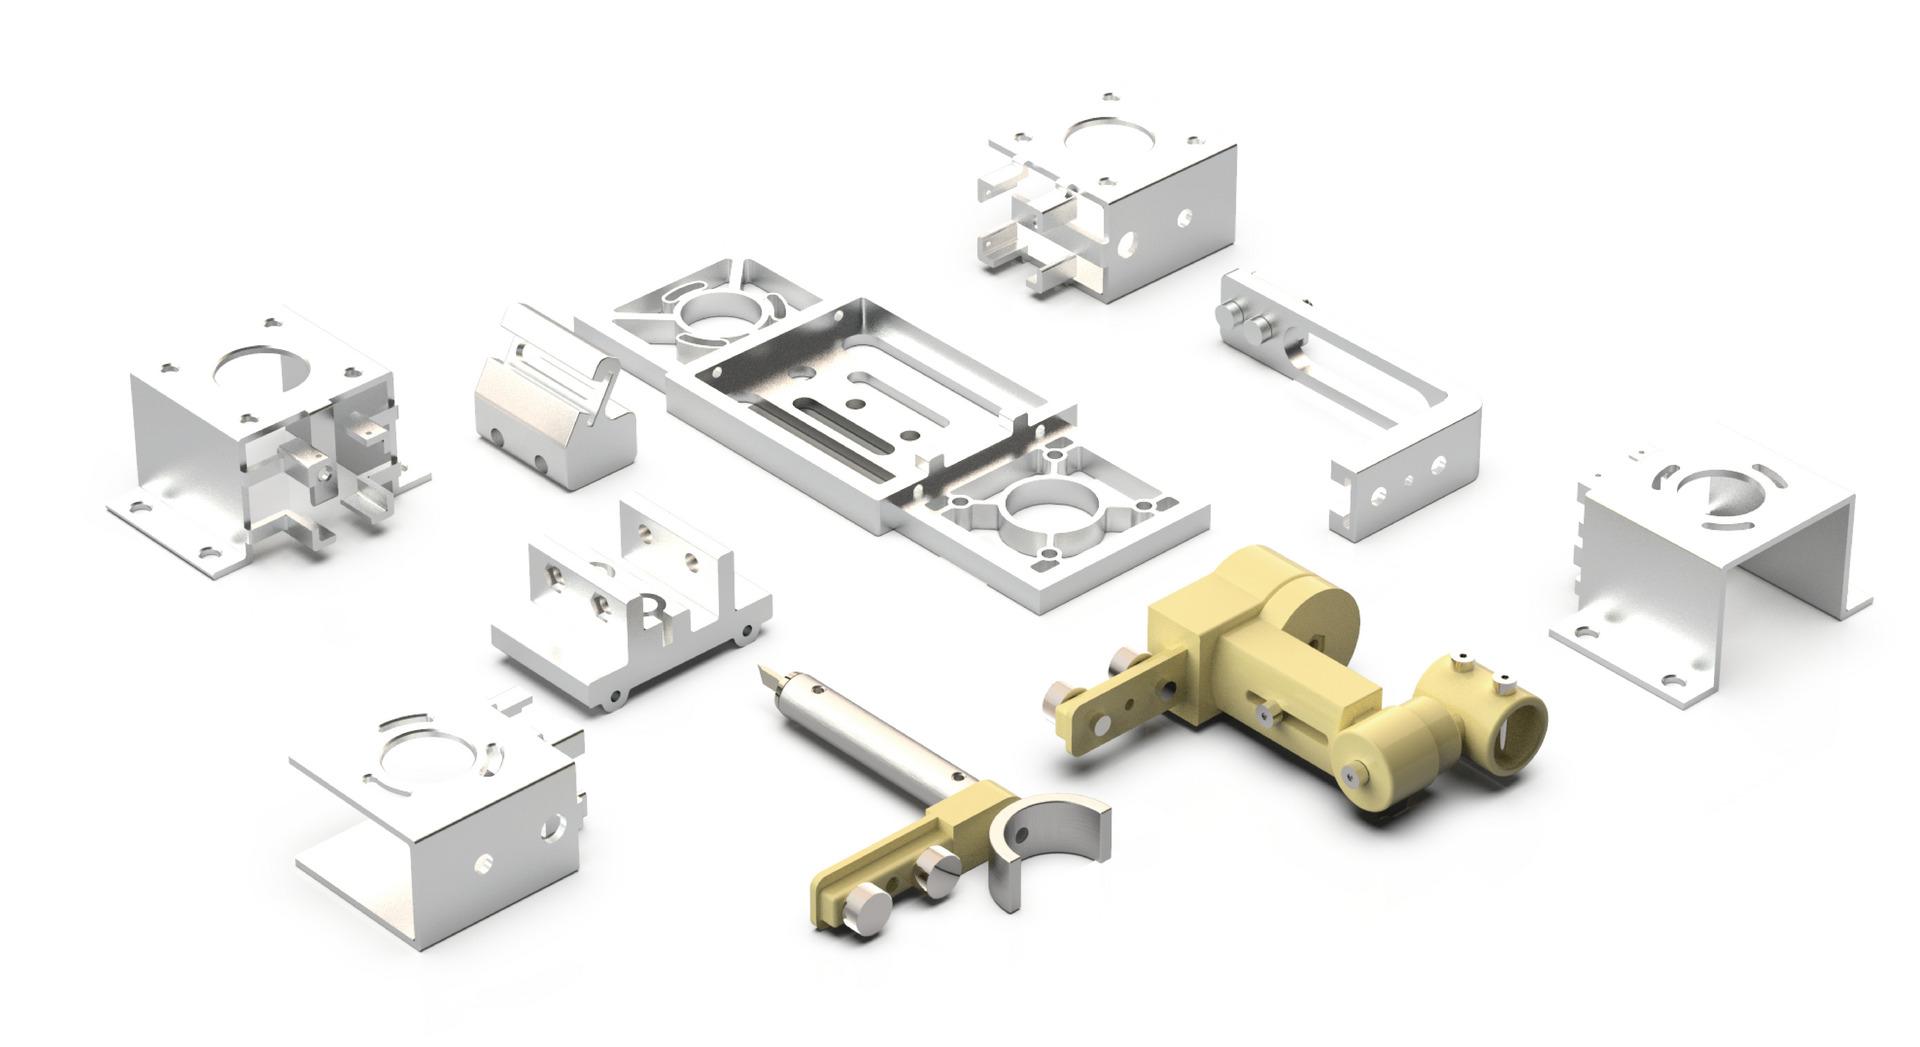 part deisgn for manufacture